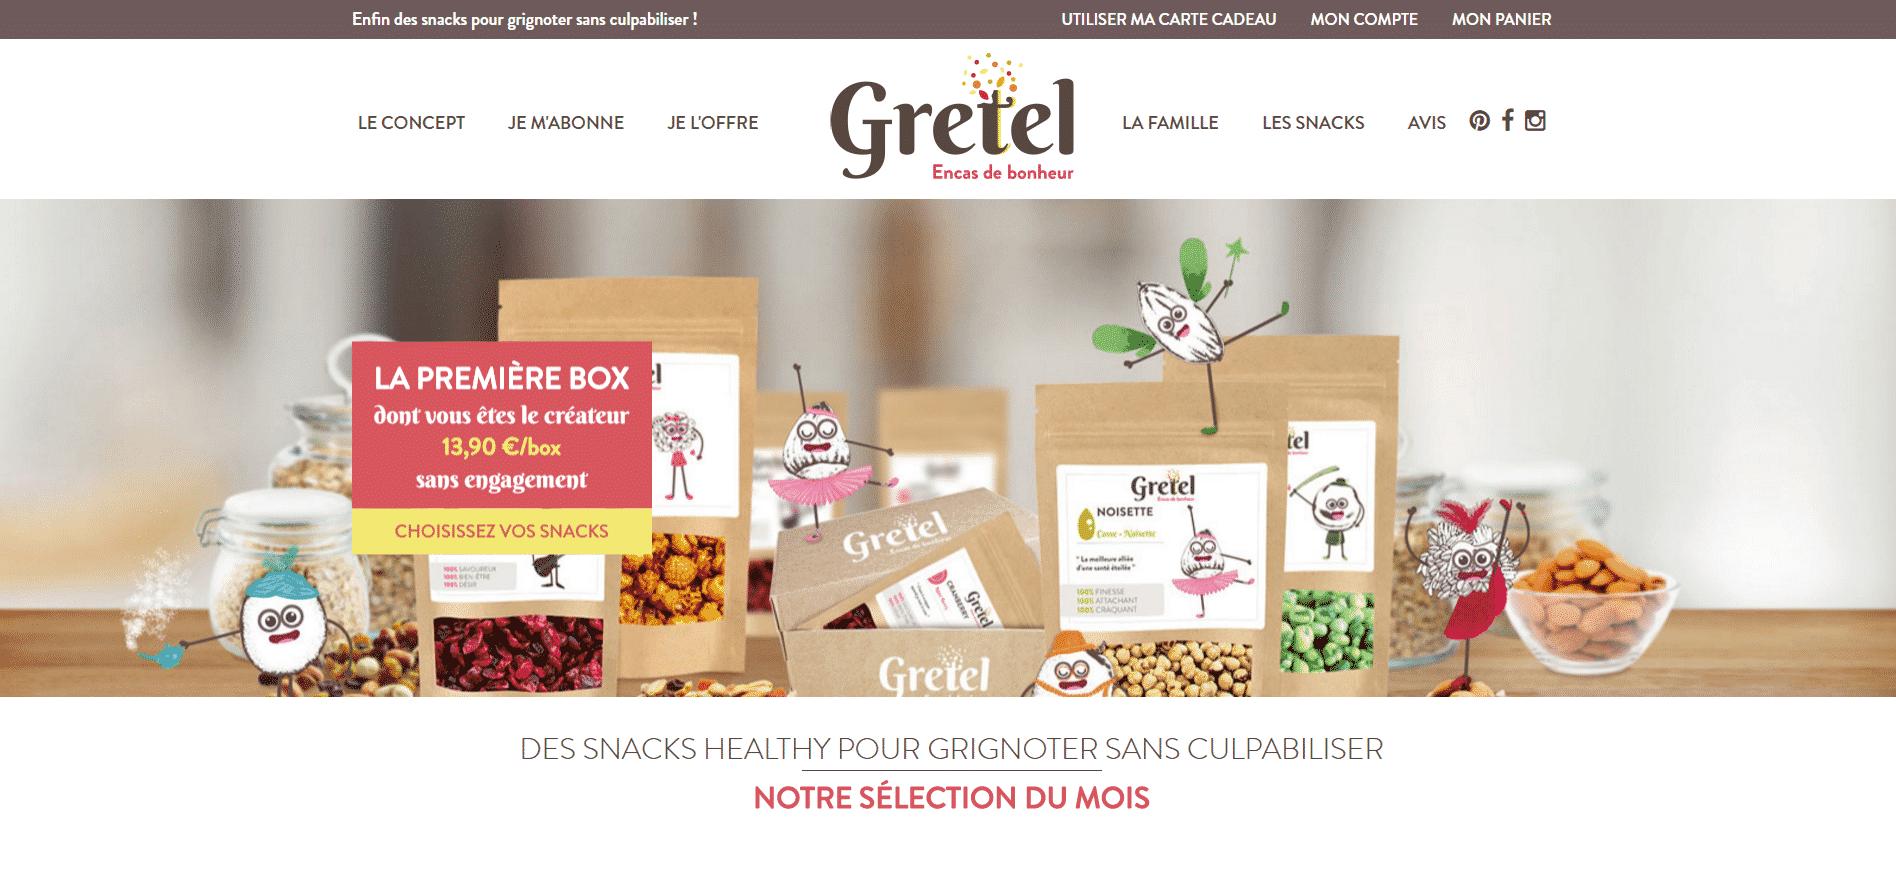 nl1466-image-gretel